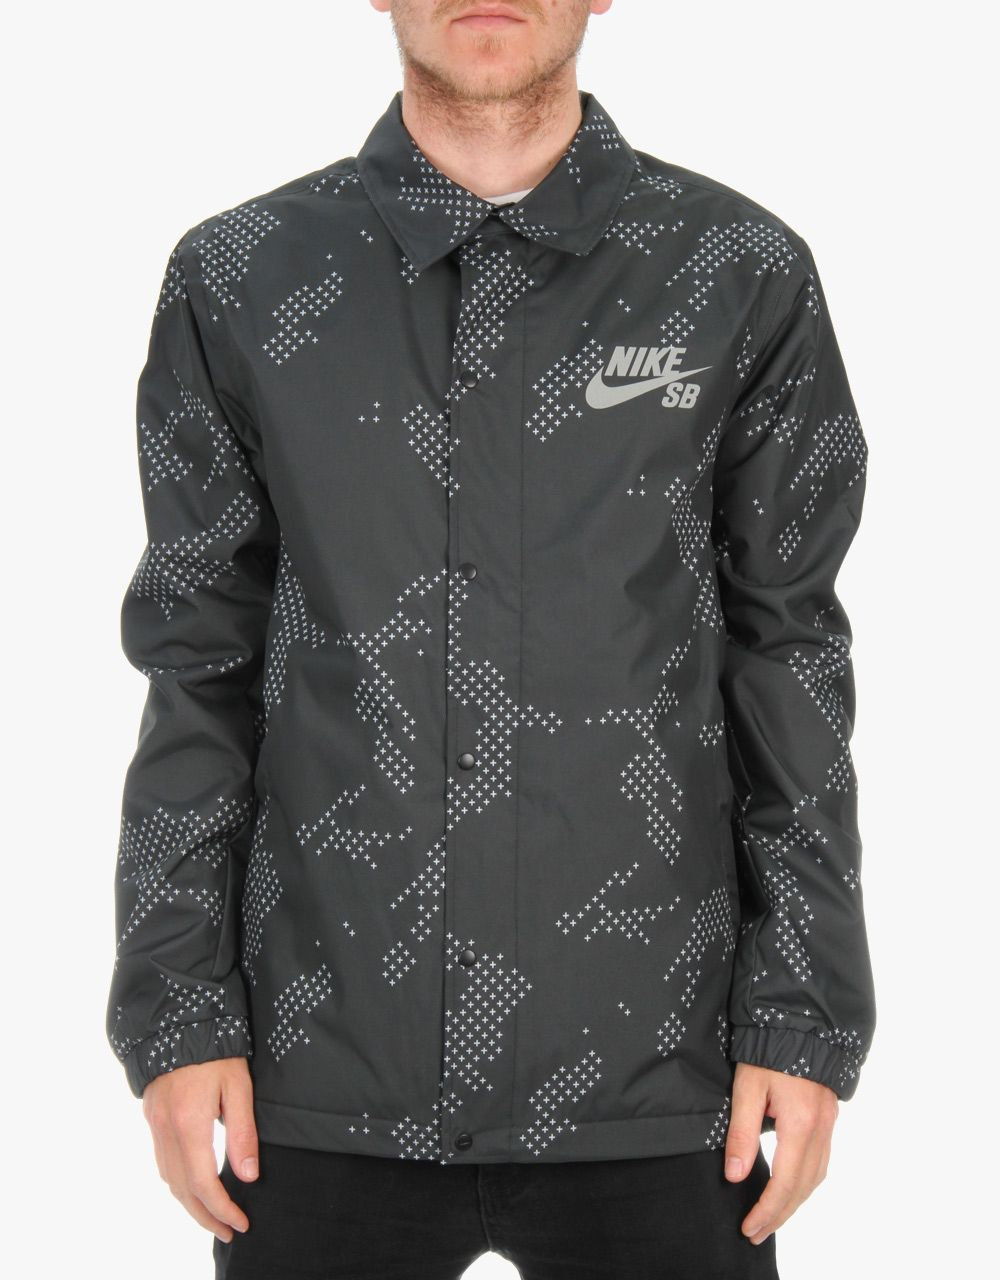 Nike jacket army - Nike Sb Assistant Coaches Jacket Black Anthracite White